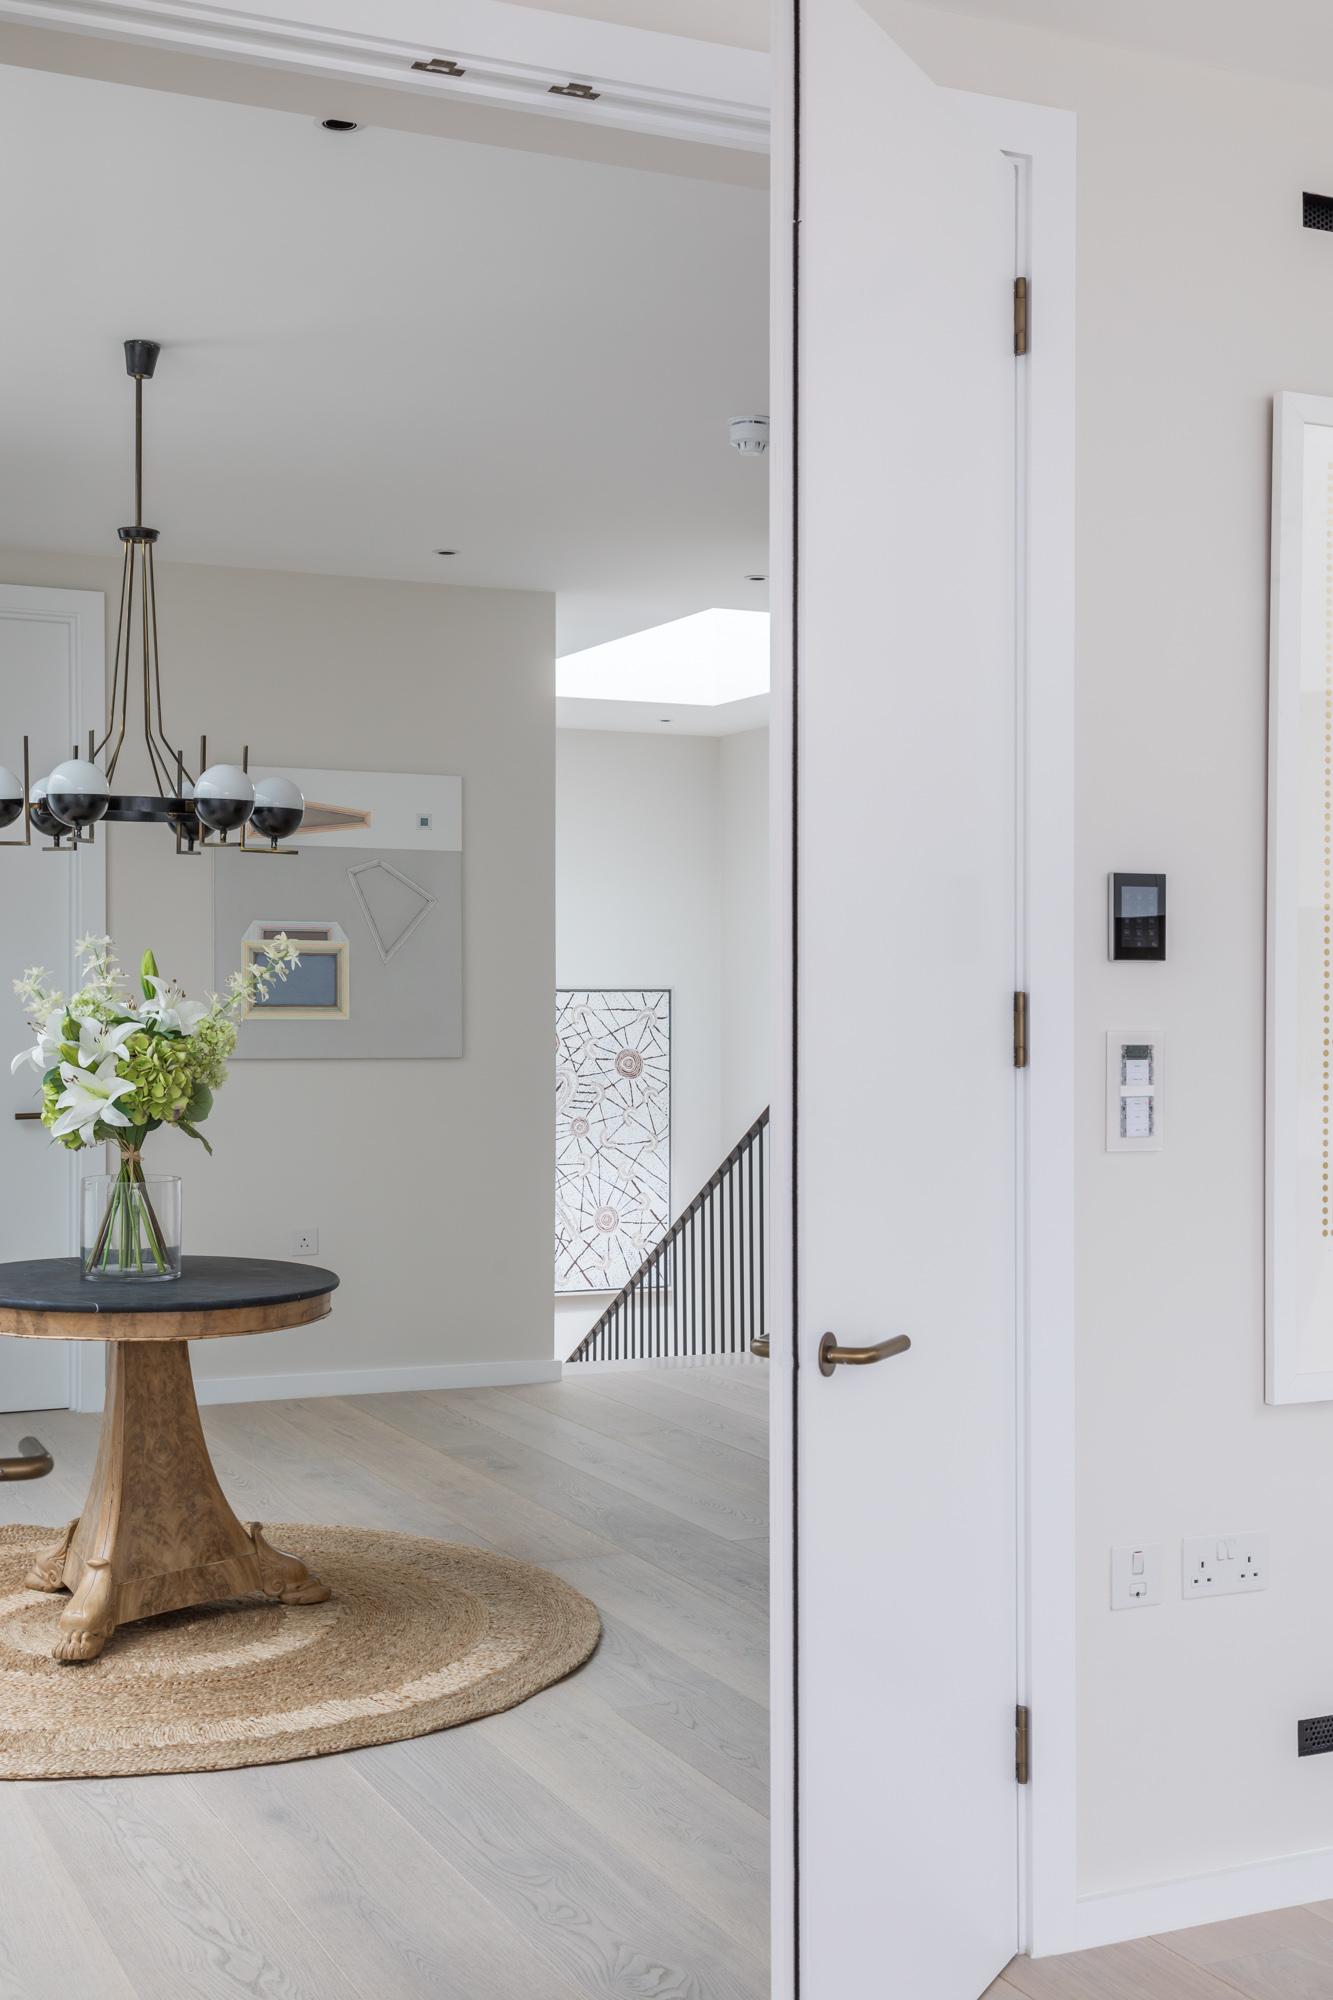 jonathan bond, interior photographer, bedroom view of round table in hallway, battersea, london